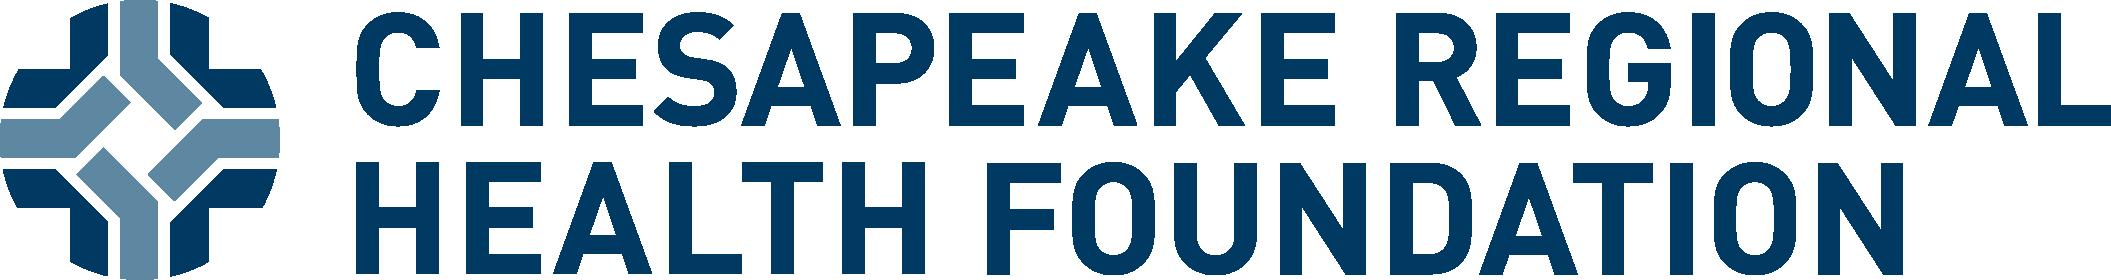 Chesapeake Regional Health Foundation